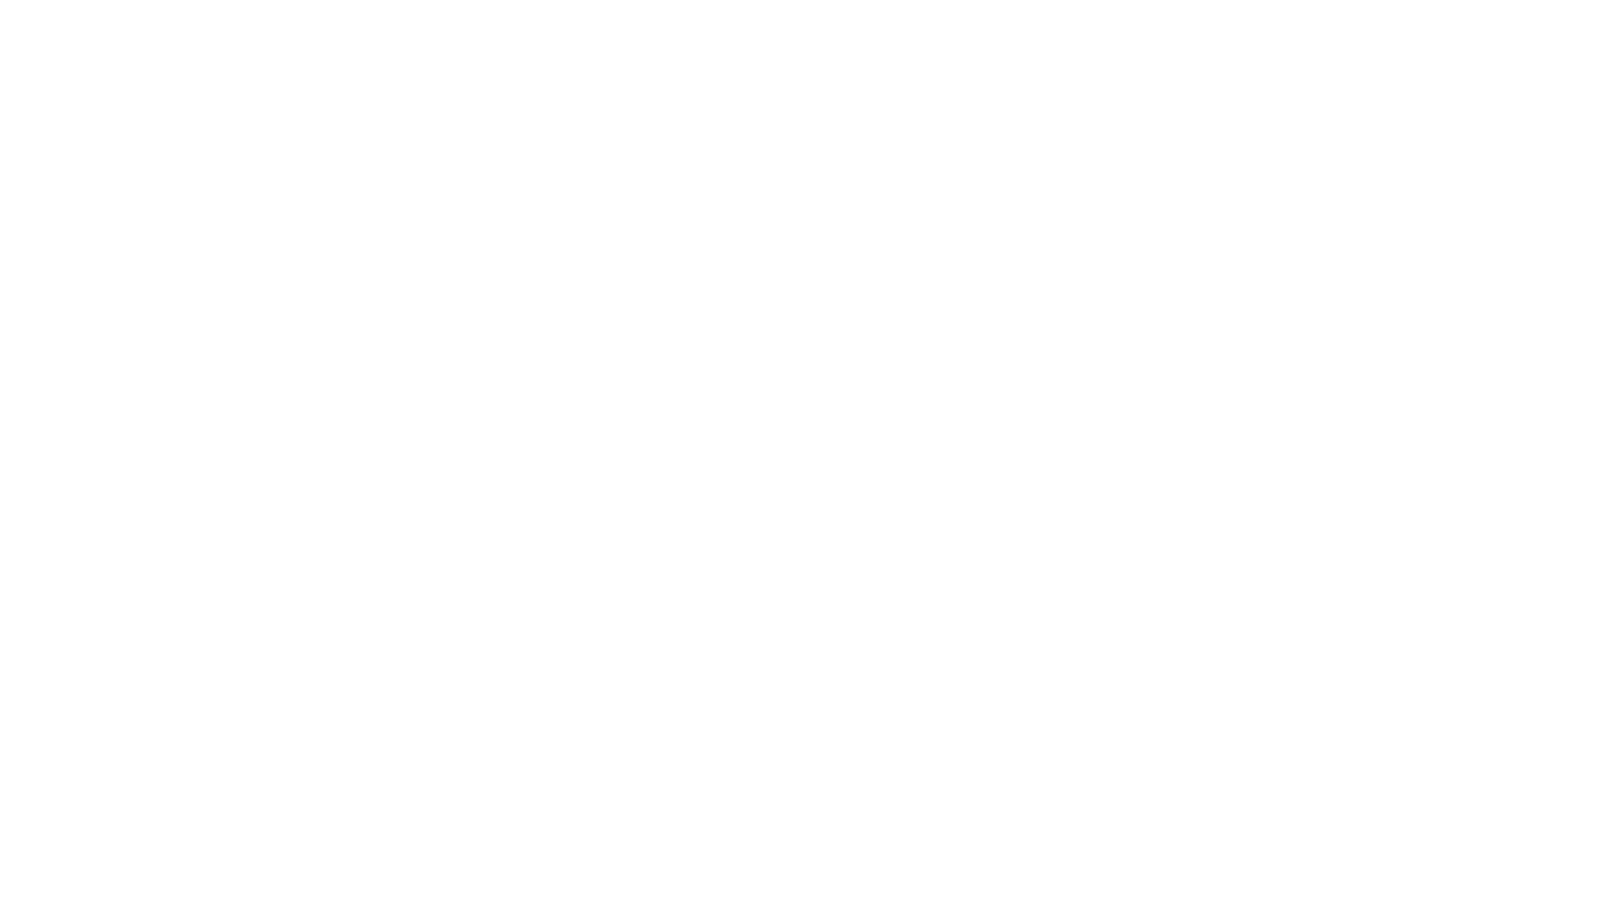 "In the 38th episode of ""In These Night"" I interviewed Deborah Blum, Director of the KSJ program at the MIT about the Science Journalism and future if it .در شب سی و هشتم در این شب ها با دبورا بلوم، مدیر برنامه روزنامه نگاری علم نایت در دانشگاه ام آی تی، نویسنده و روزنامه نگار علم و برنده جایزه پولیتزر درباره چیستی روزنامه نگاری علم و آینده آن گفتگو کردم.   www.deborahblum.com https://ksj.mit.edu https://undark.org"